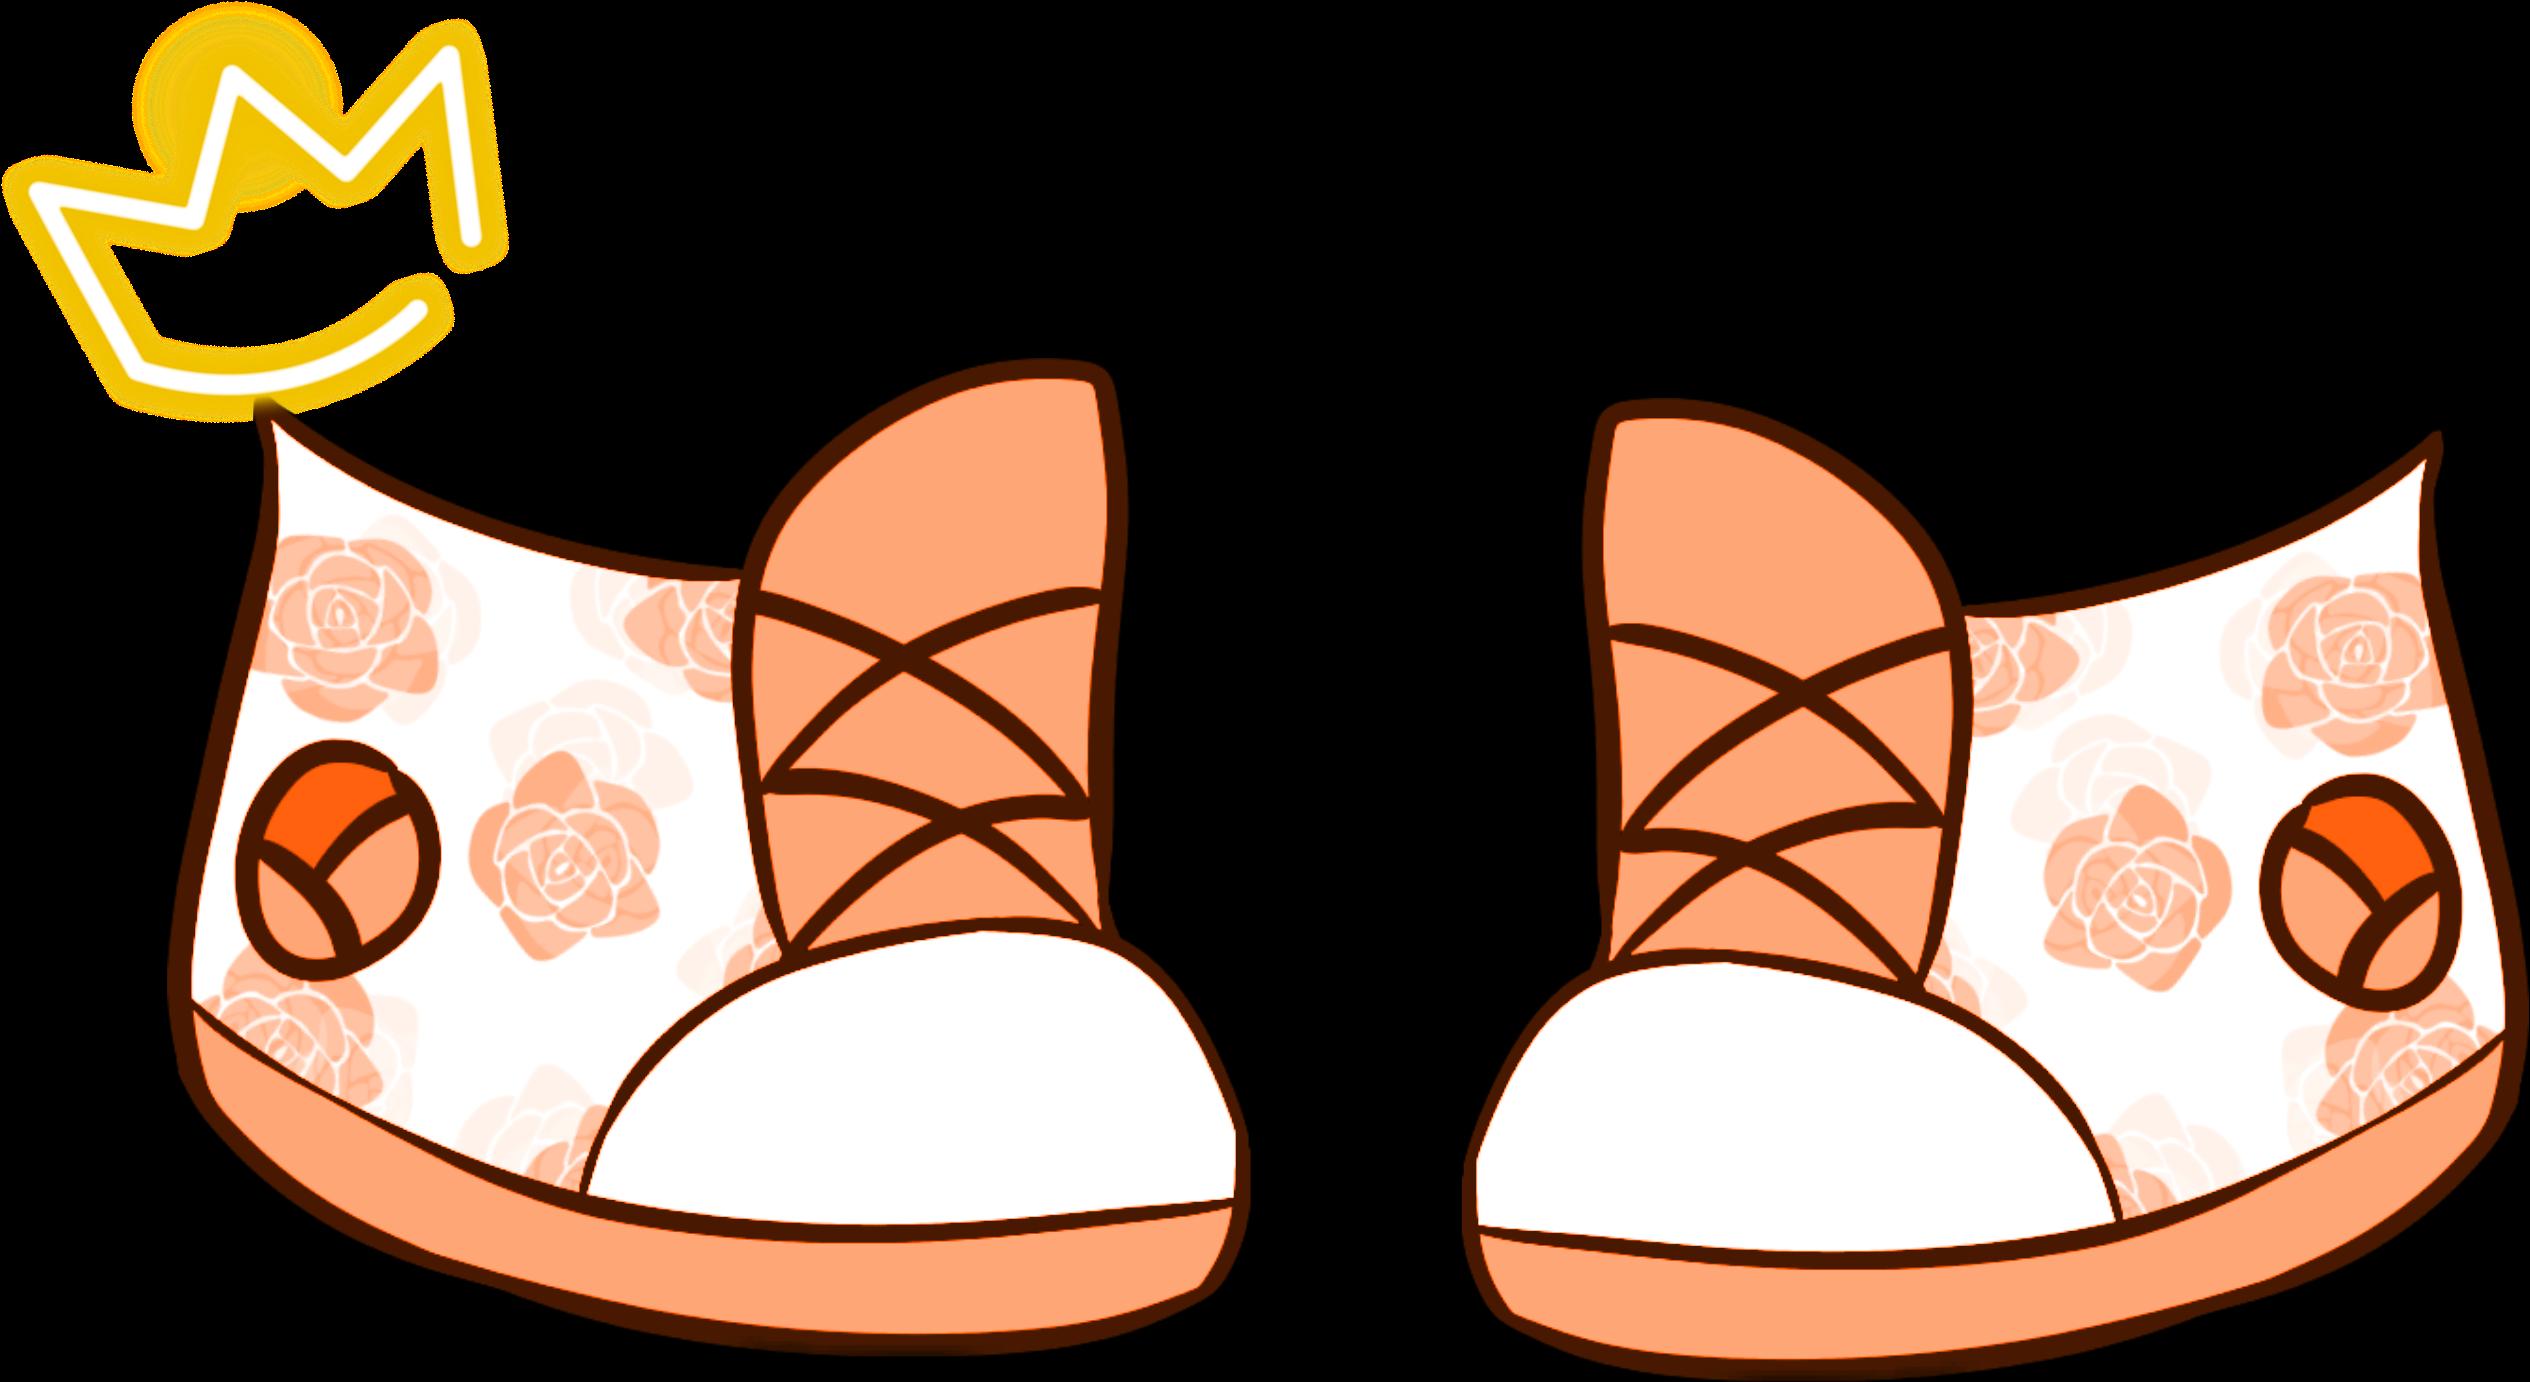 View Full Size Gacha Gachalife Gachalifedit Gachashoe Gachashoes Gacha Life Shoes Edits Clip Drawing Anime Clothes Cute Cartoon Drawings Cartoon Outfits